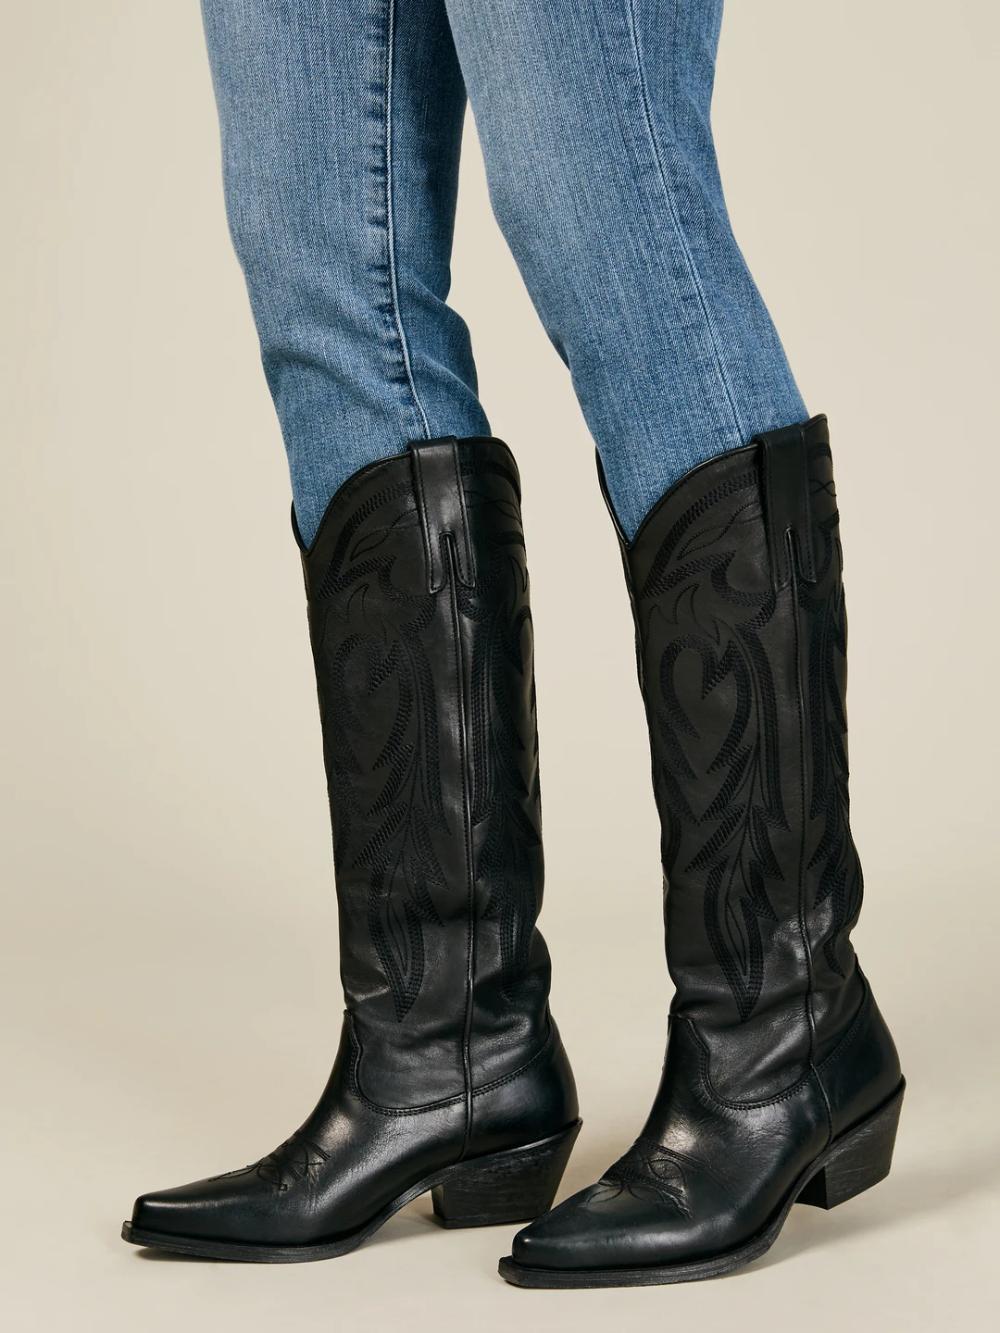 The Giada Tall Cowboy Boot Western Inspired Boot Black Leather M Gemi Boots Black Cowboy Boots Outfit Black Leather Cowboy Boots [ 1333 x 1000 Pixel ]